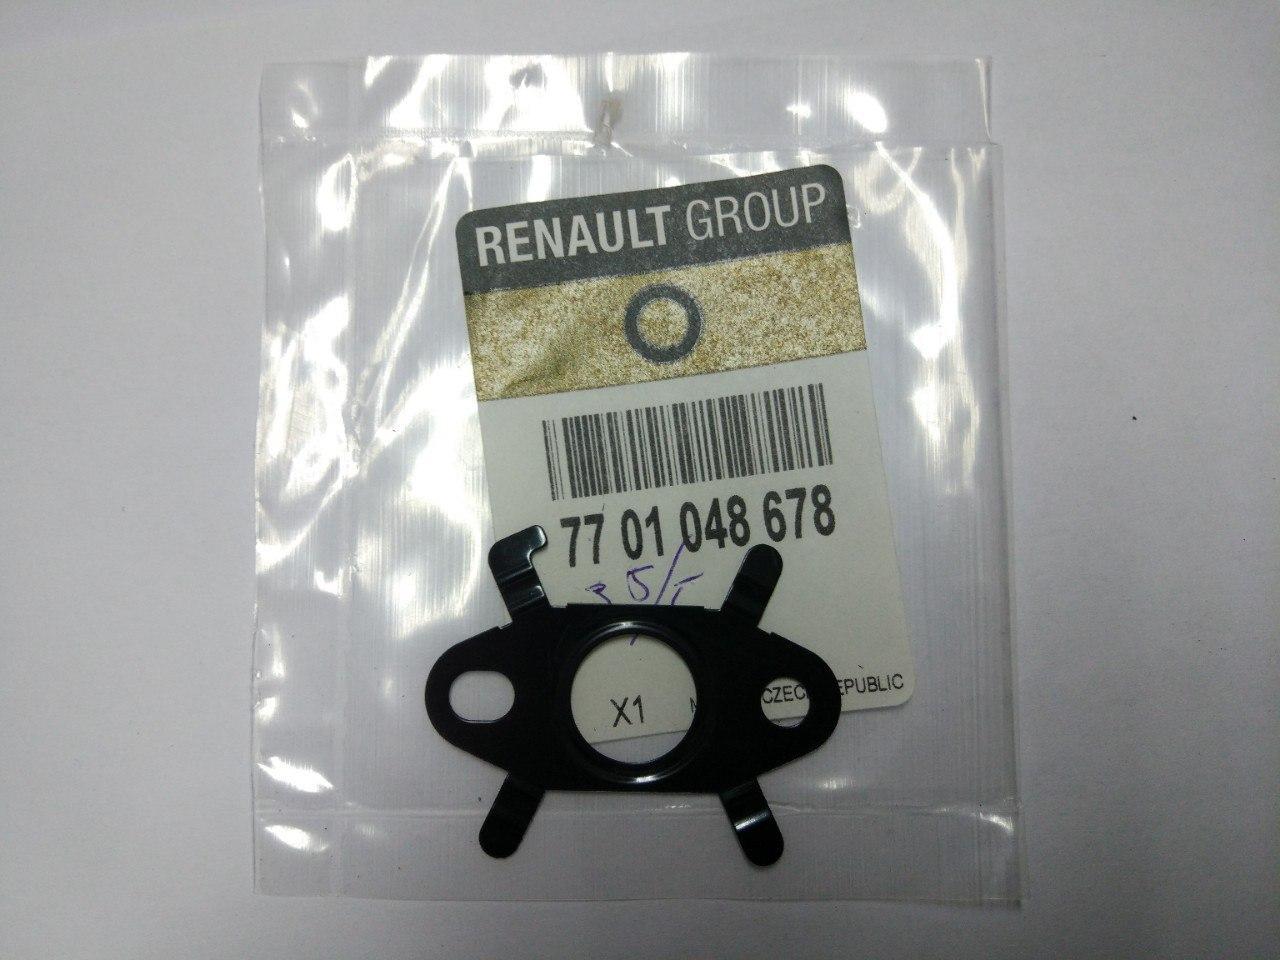 Прокладка випускної масляної трубки Renault Trafic, Opel Vivaro, 2001-2013, Renault 7701048678